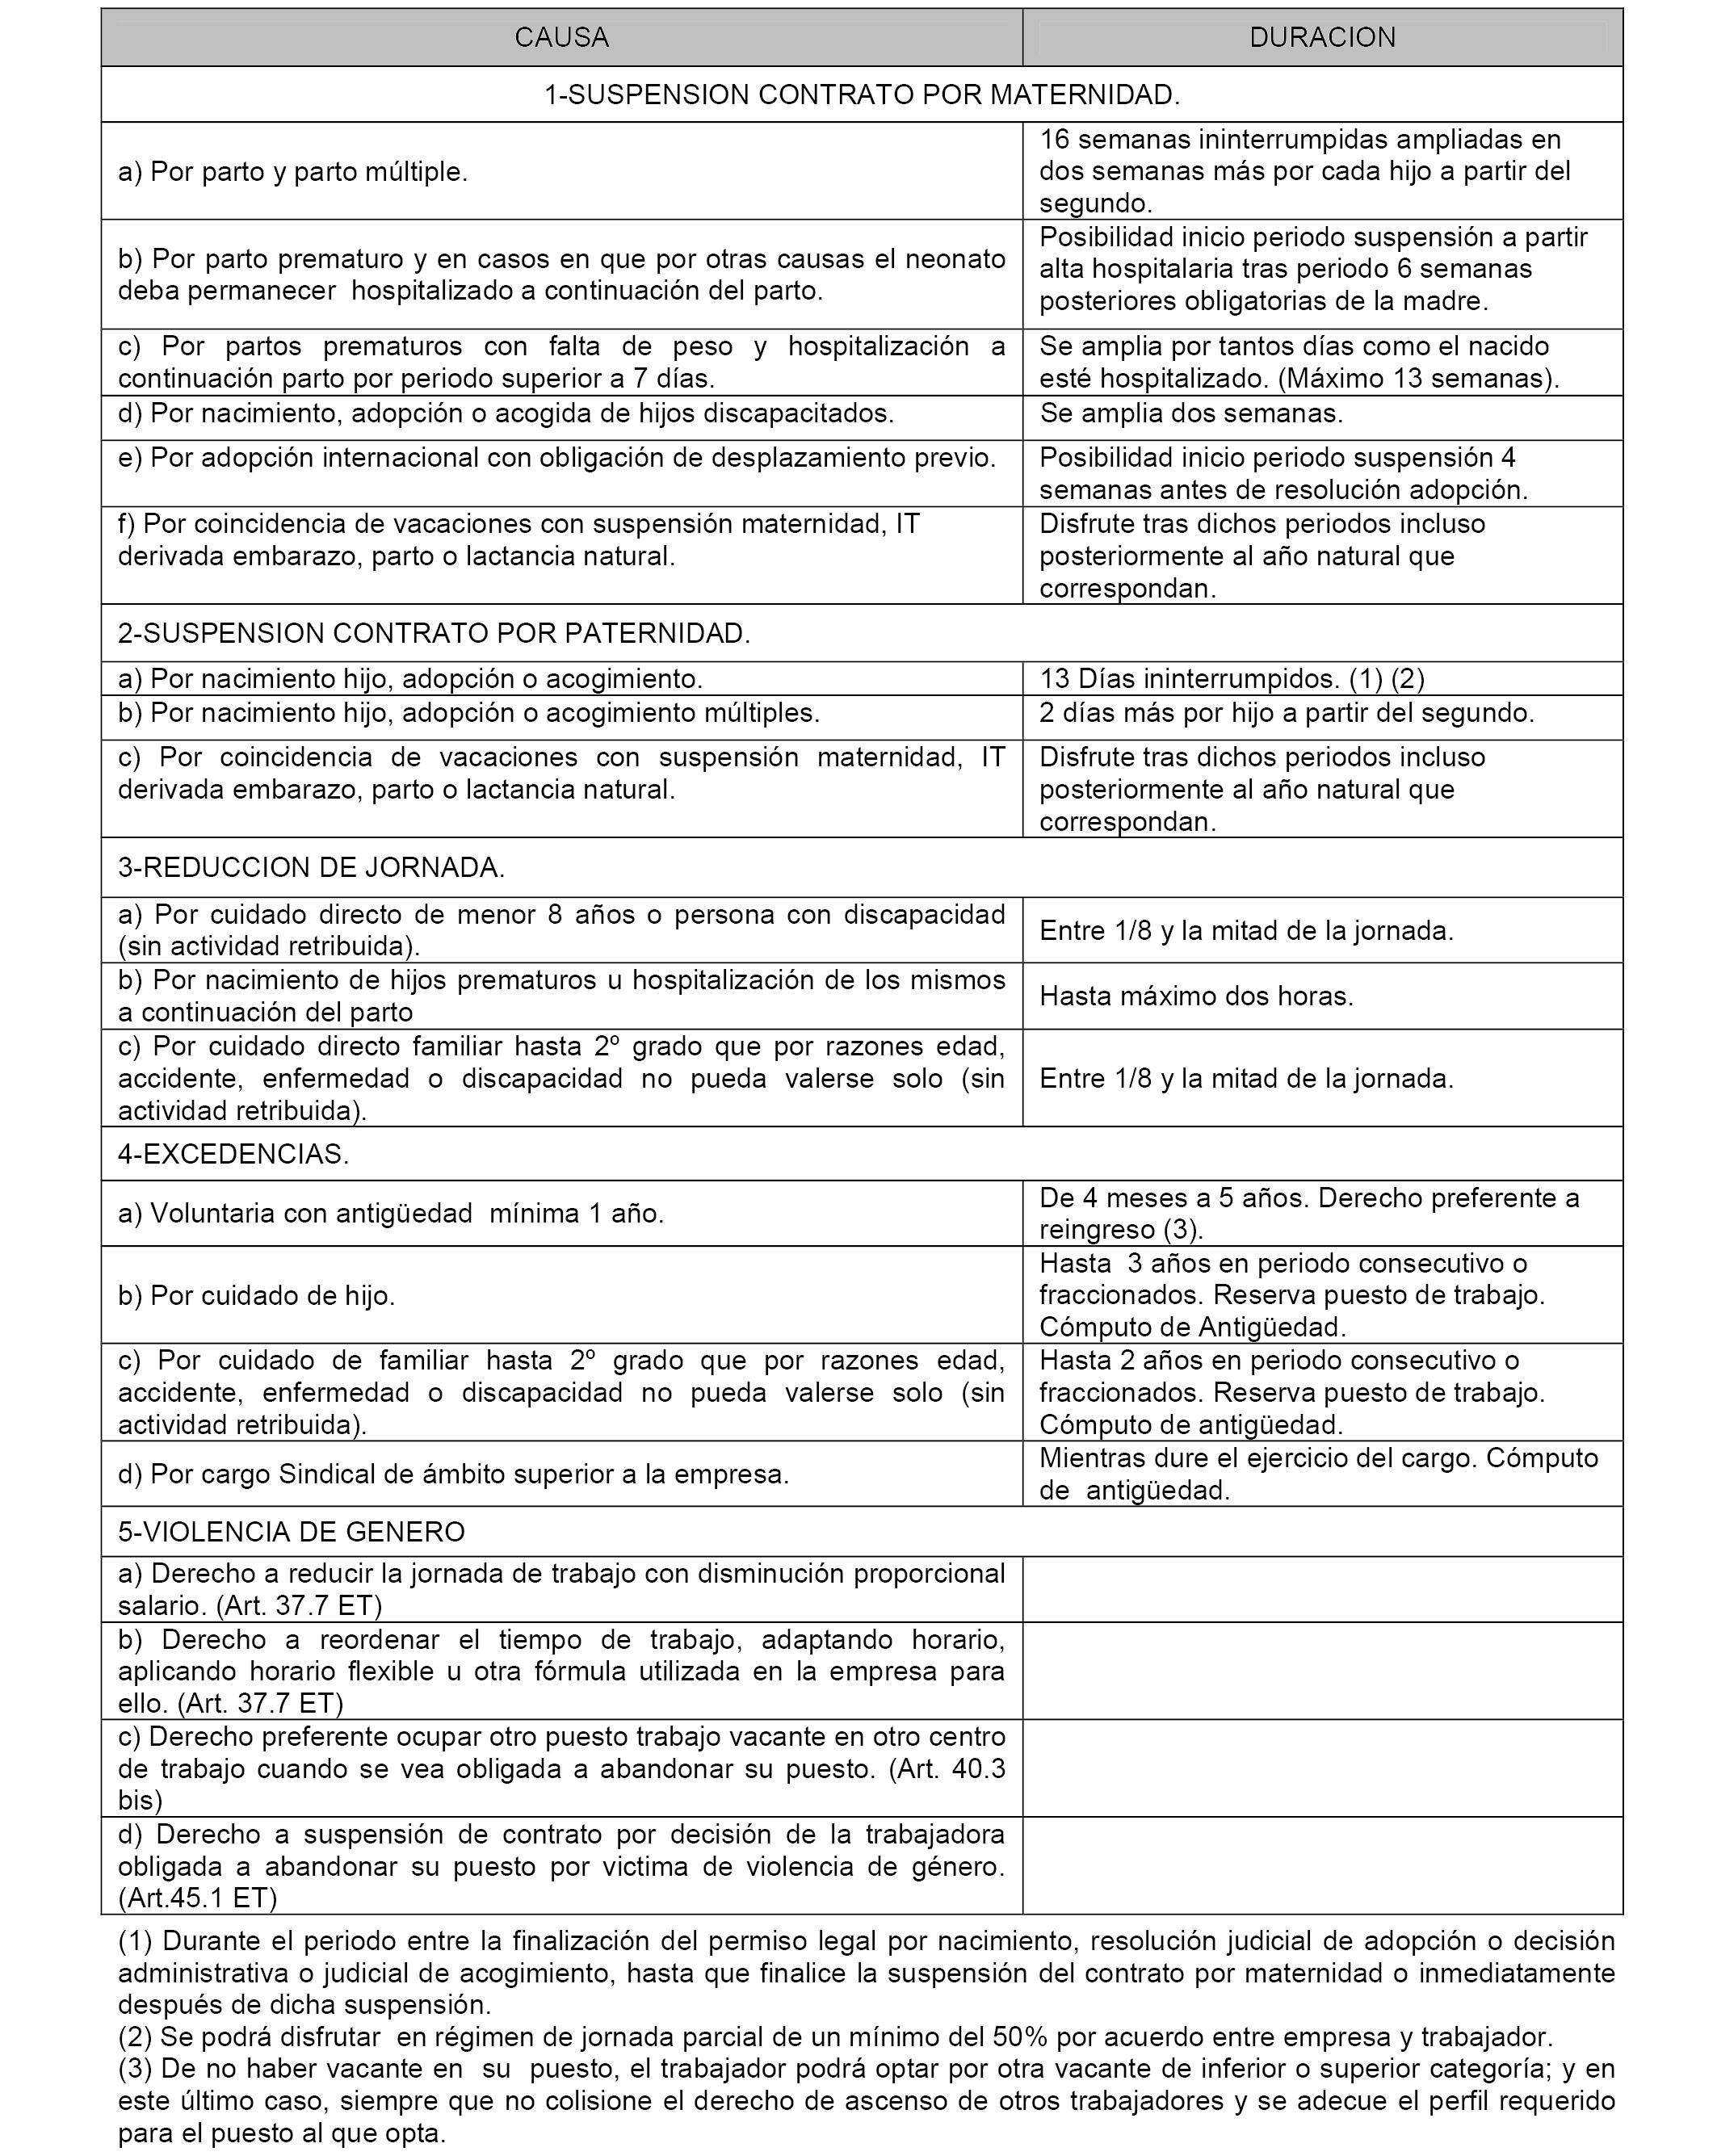 BOE.es - Documento BOE-A-2013-9117